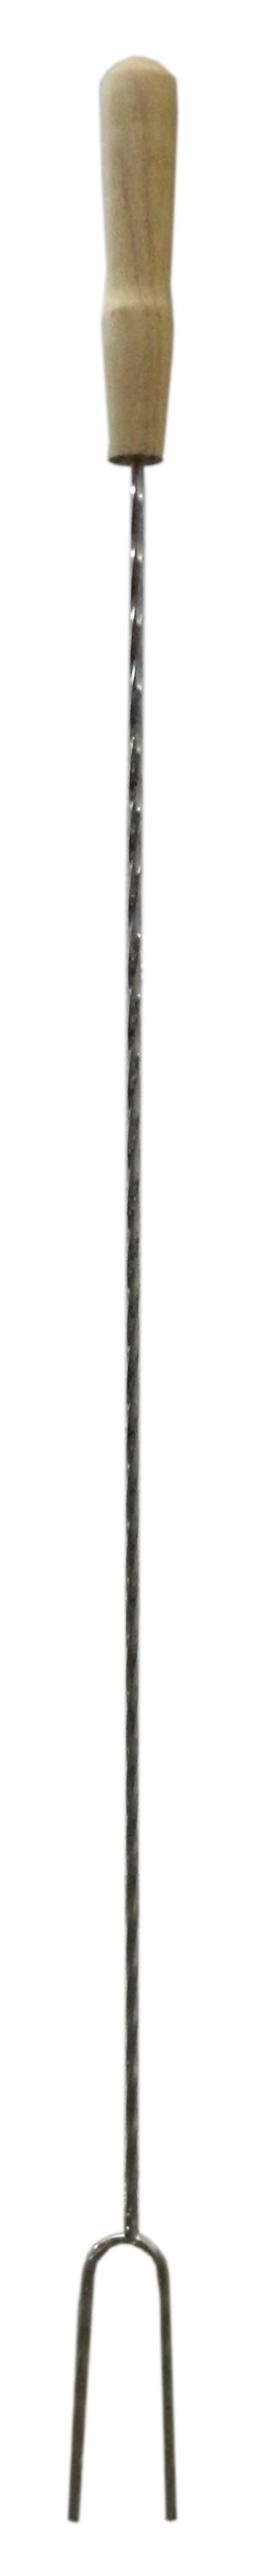 Grillgabel 80cm verchromt Bild 1